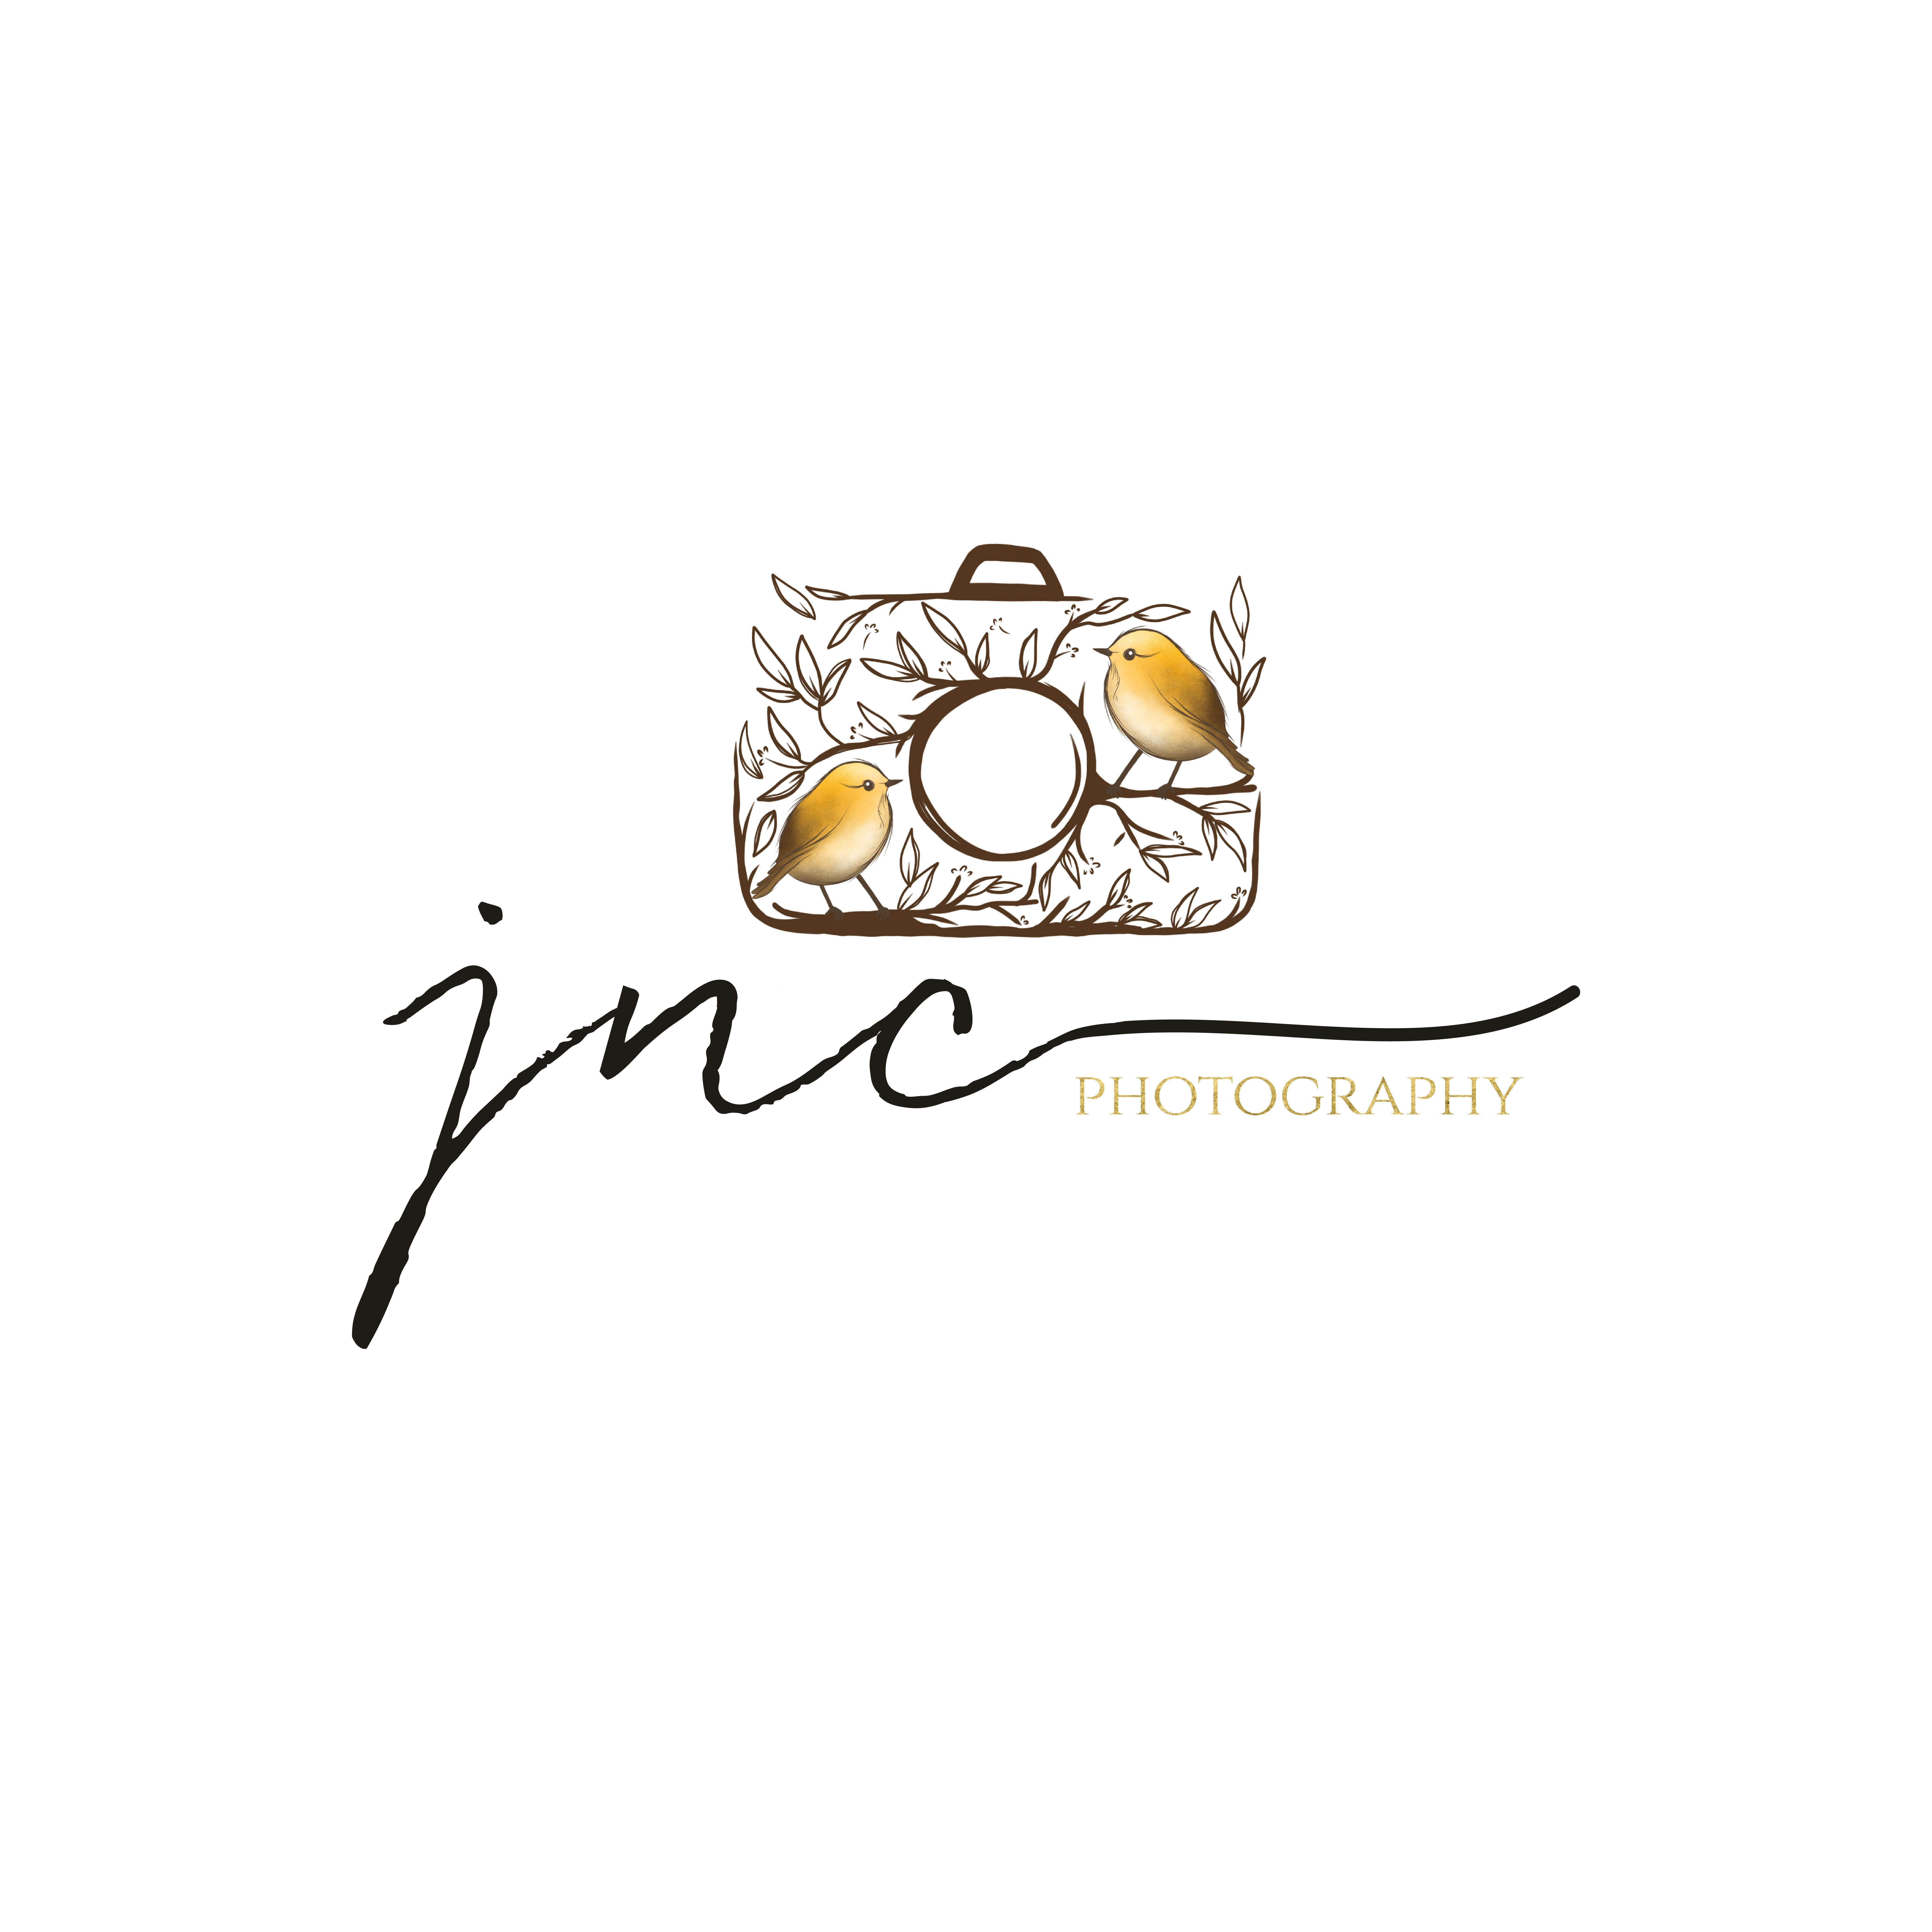 custom photography logo. | Logos and Branding | Pinterest